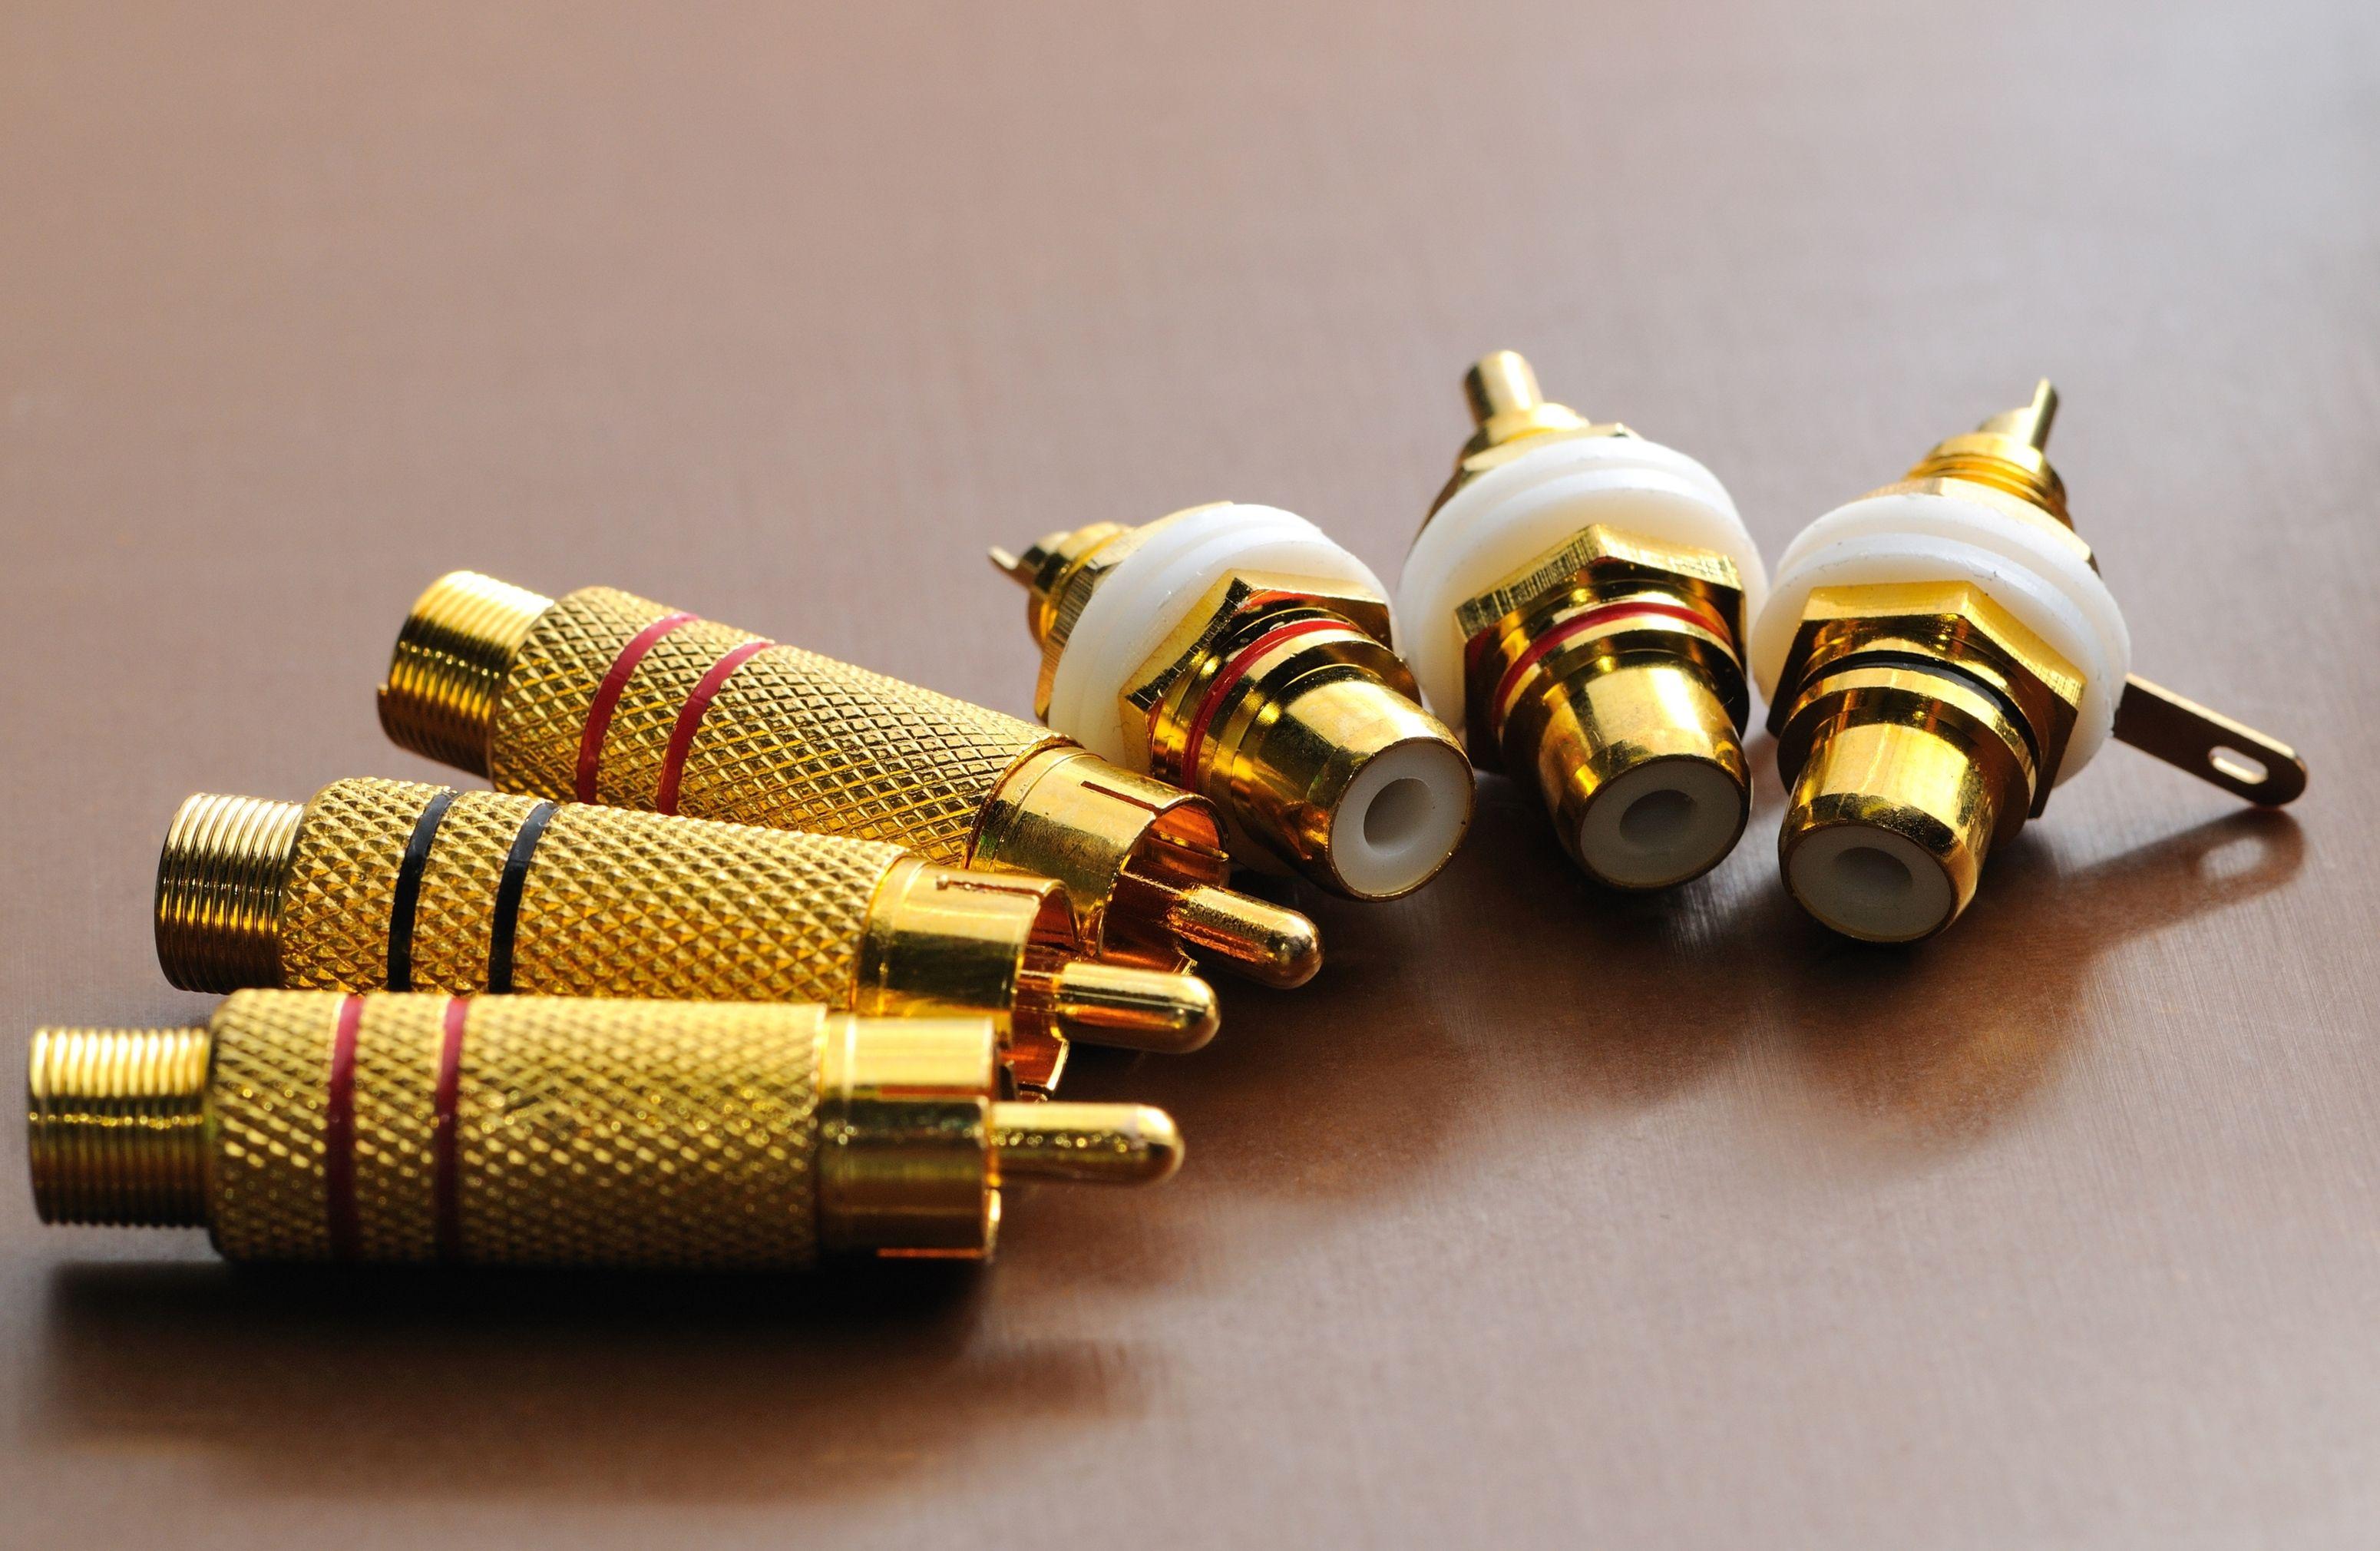 close-up-four-golden-plugs-stand-and-lie-VTXJZ7X.jpg